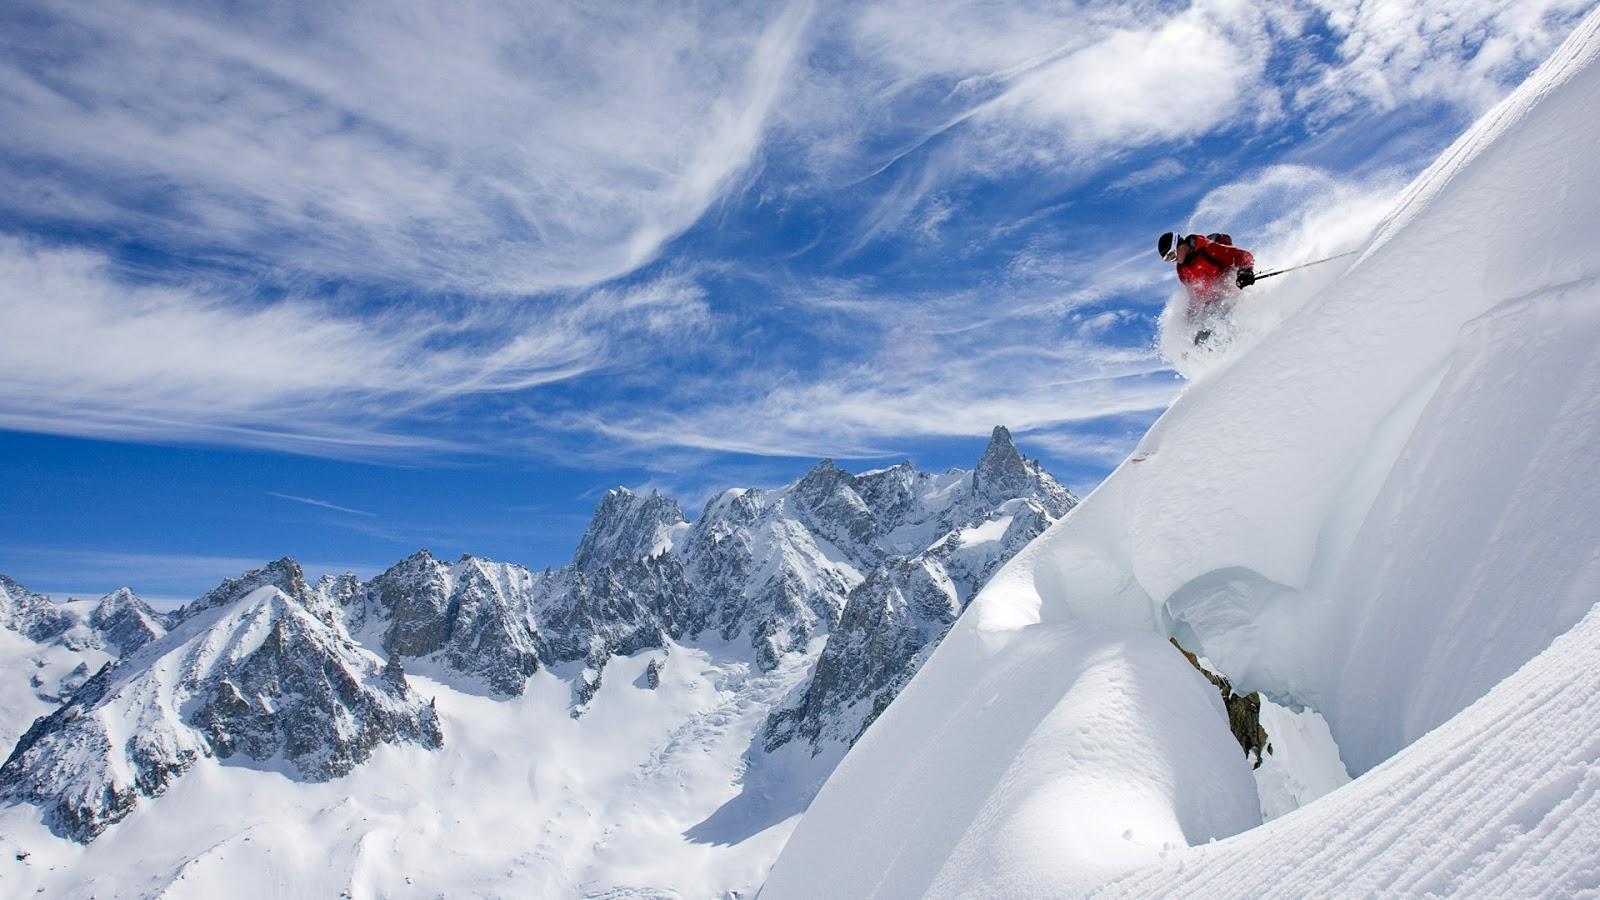 http://1.bp.blogspot.com/-8MwgHfachZ8/UKoiBuMzZJI/AAAAAAAAHL8/nR_mhGTYsSc/s1600/Ski_Wallpaper_5.jpg